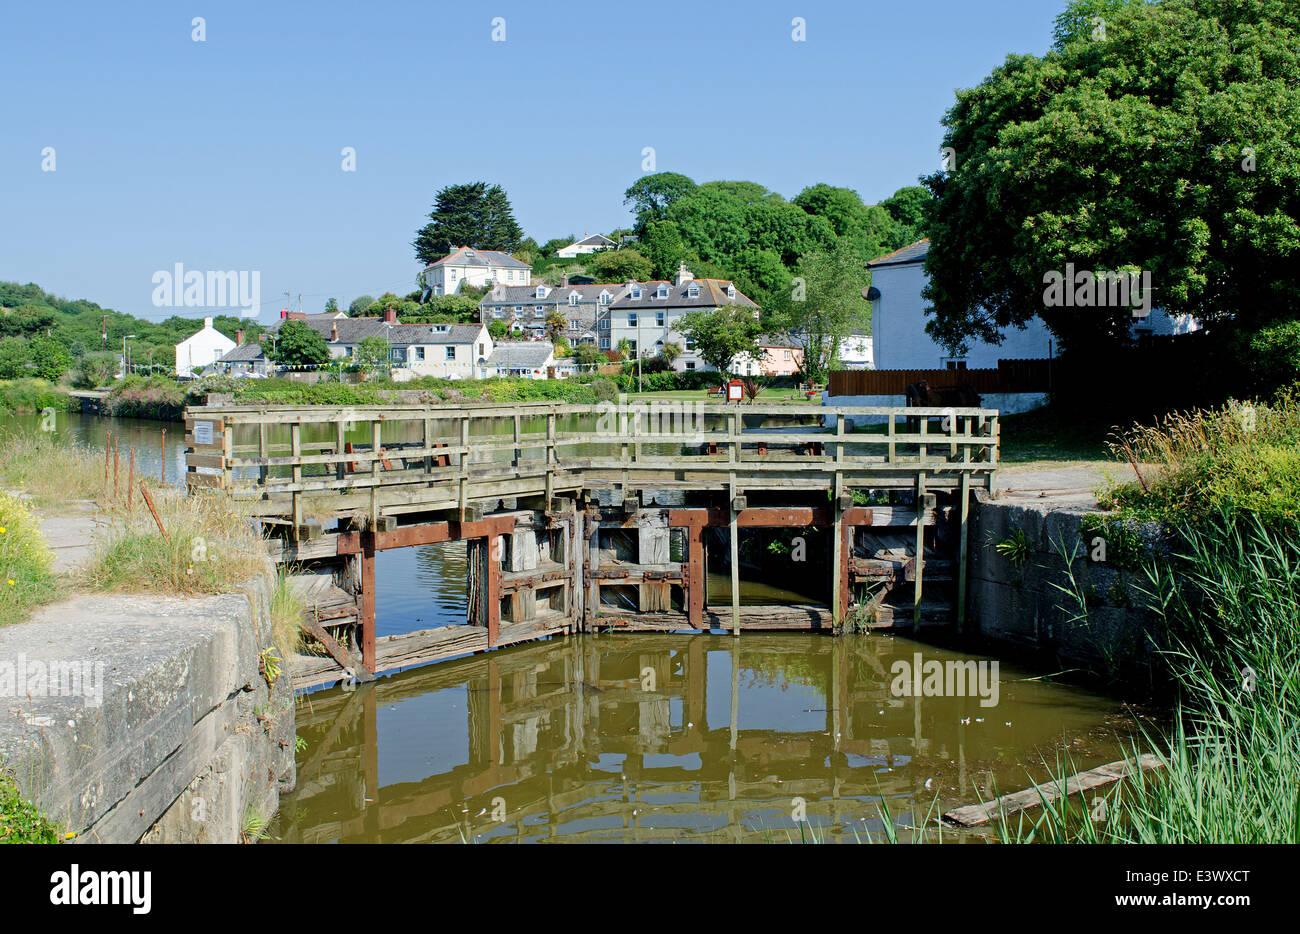 the old lock gates at Pentewan in cornwall, uk - Stock Image